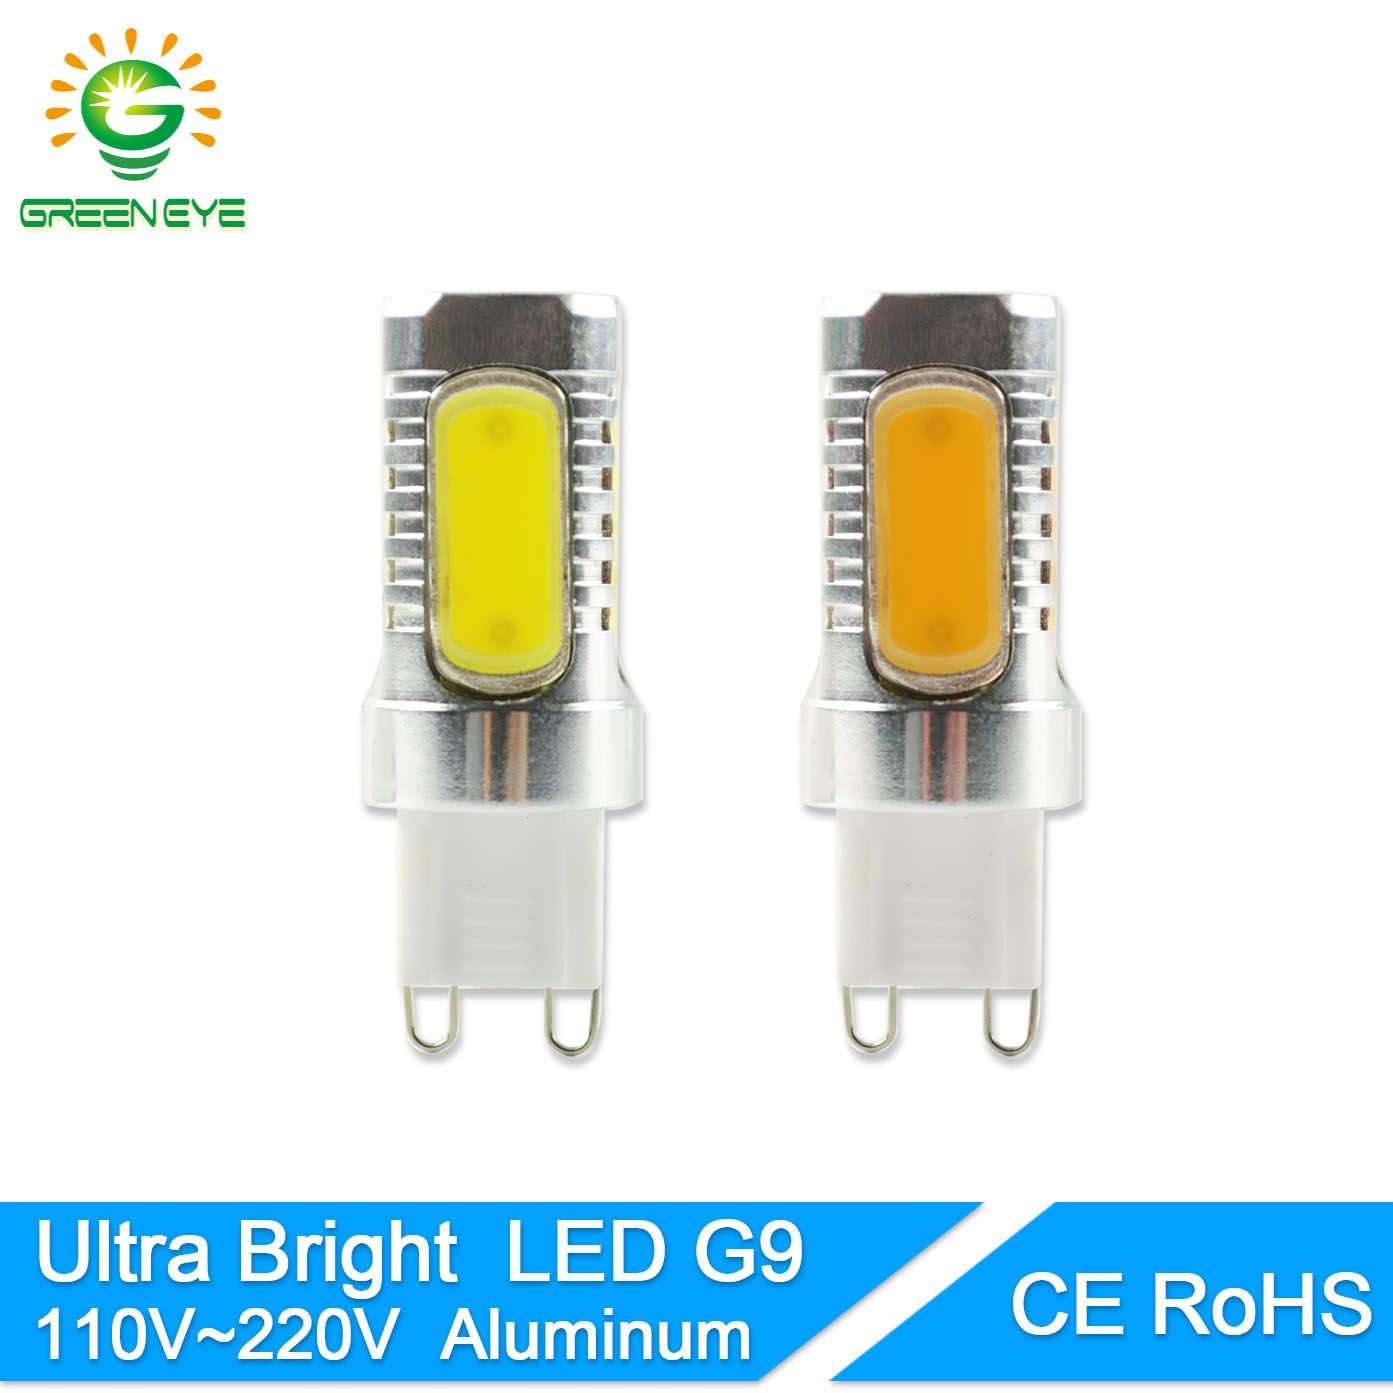 GreenEye Ultra Helle Led-lampe G9 12 Watt 110 V 220 V COB Licht Lampe Kristall Kronleuchter Scheinwerfer Ersetzen Halogen ampulle Lampara LED